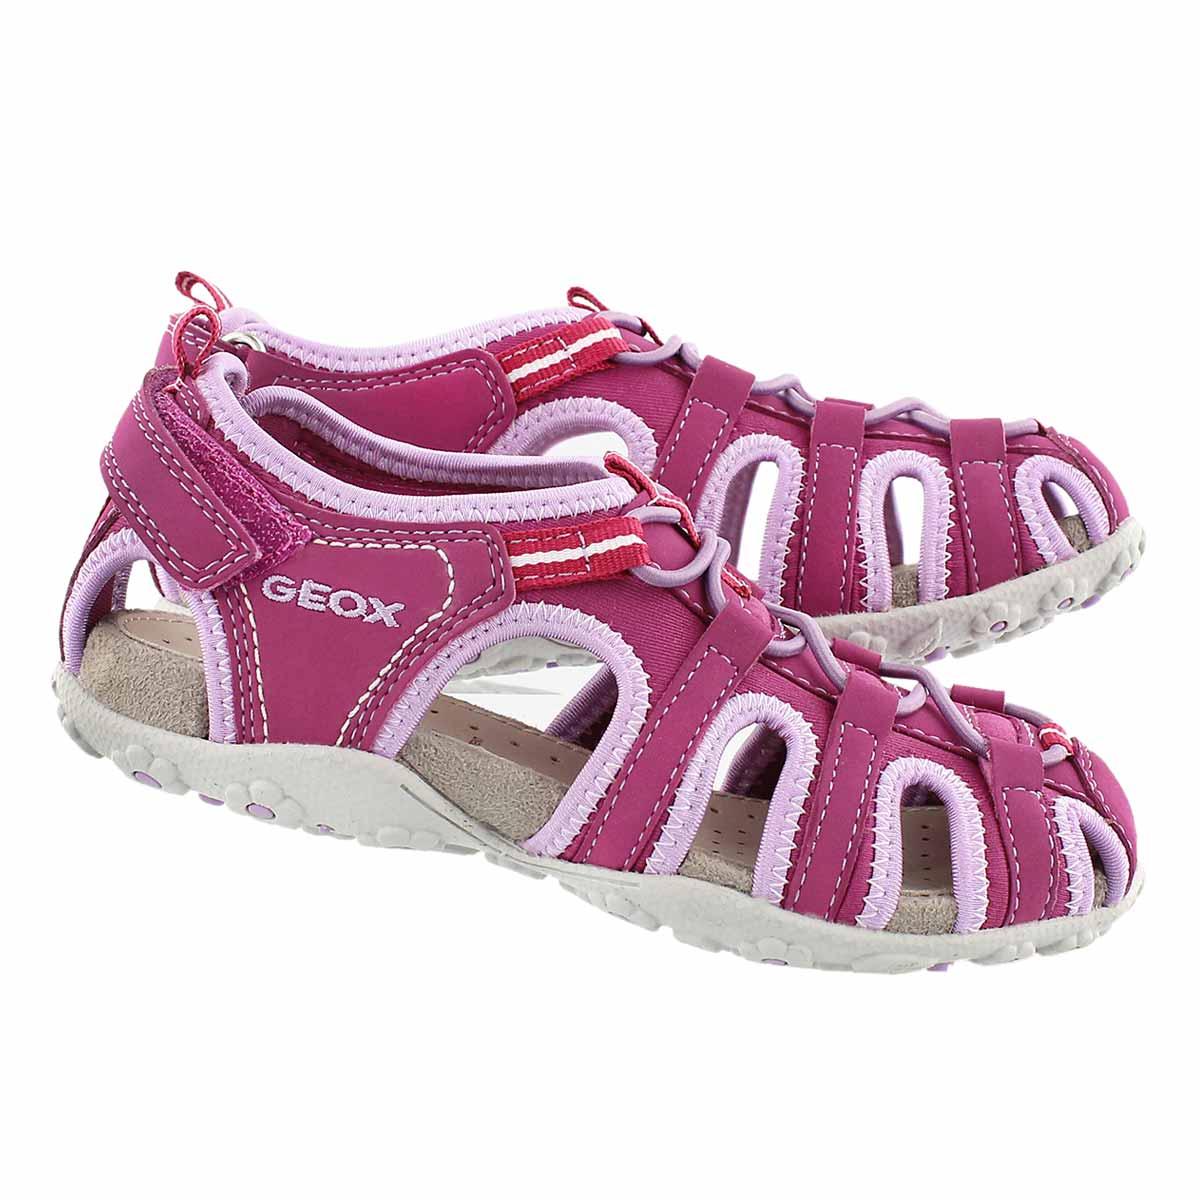 Grls Roxanne fuch/lilac closedtoe sandal